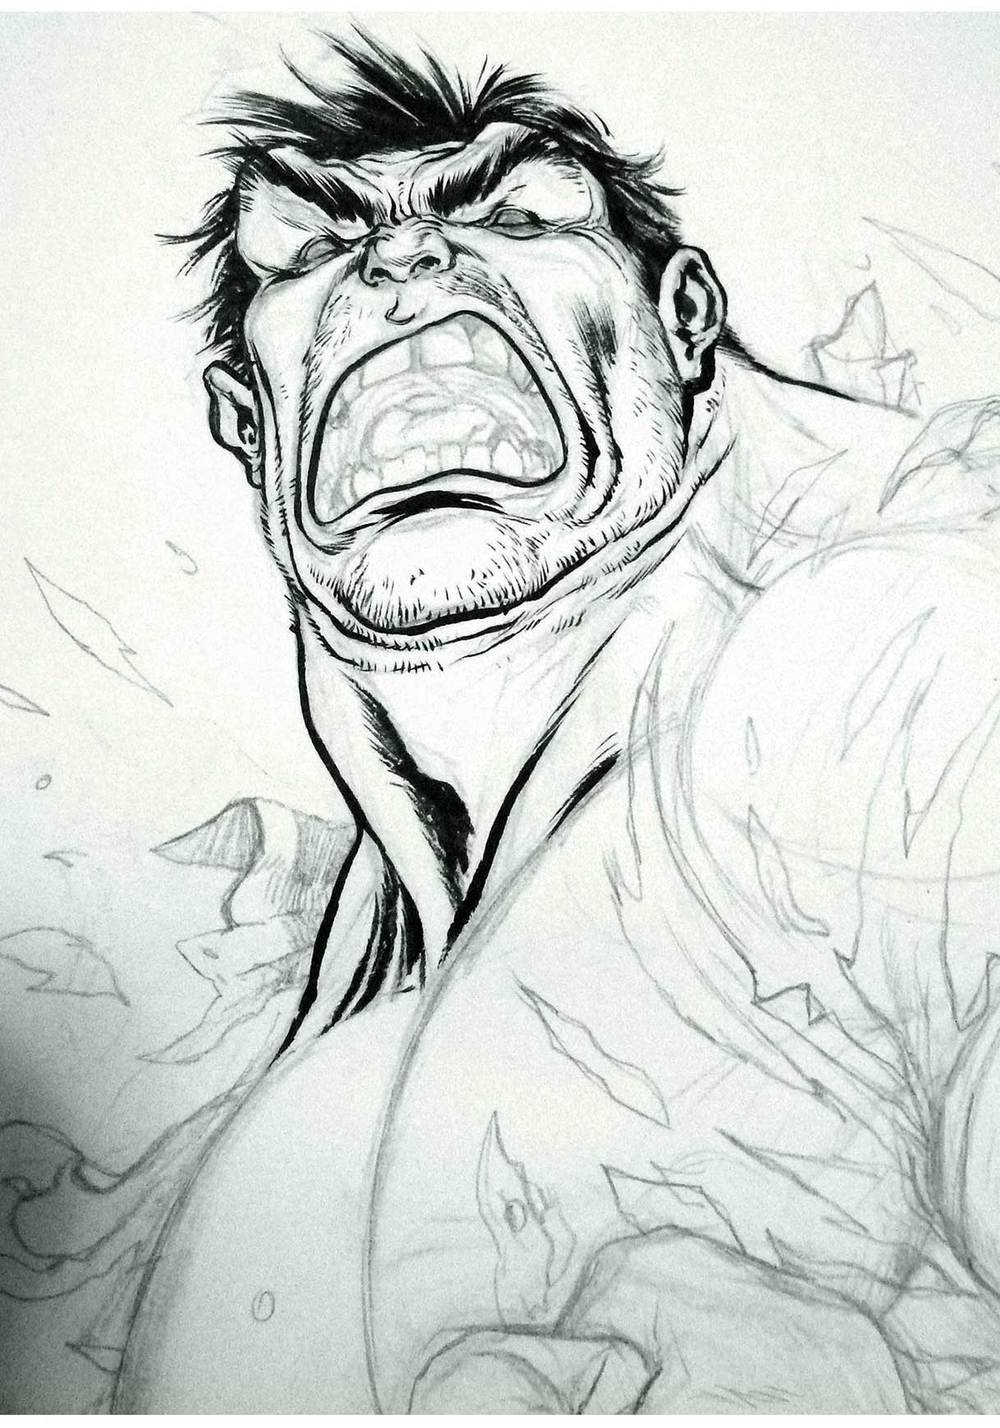 hulk-diburros-braga-10.jpg